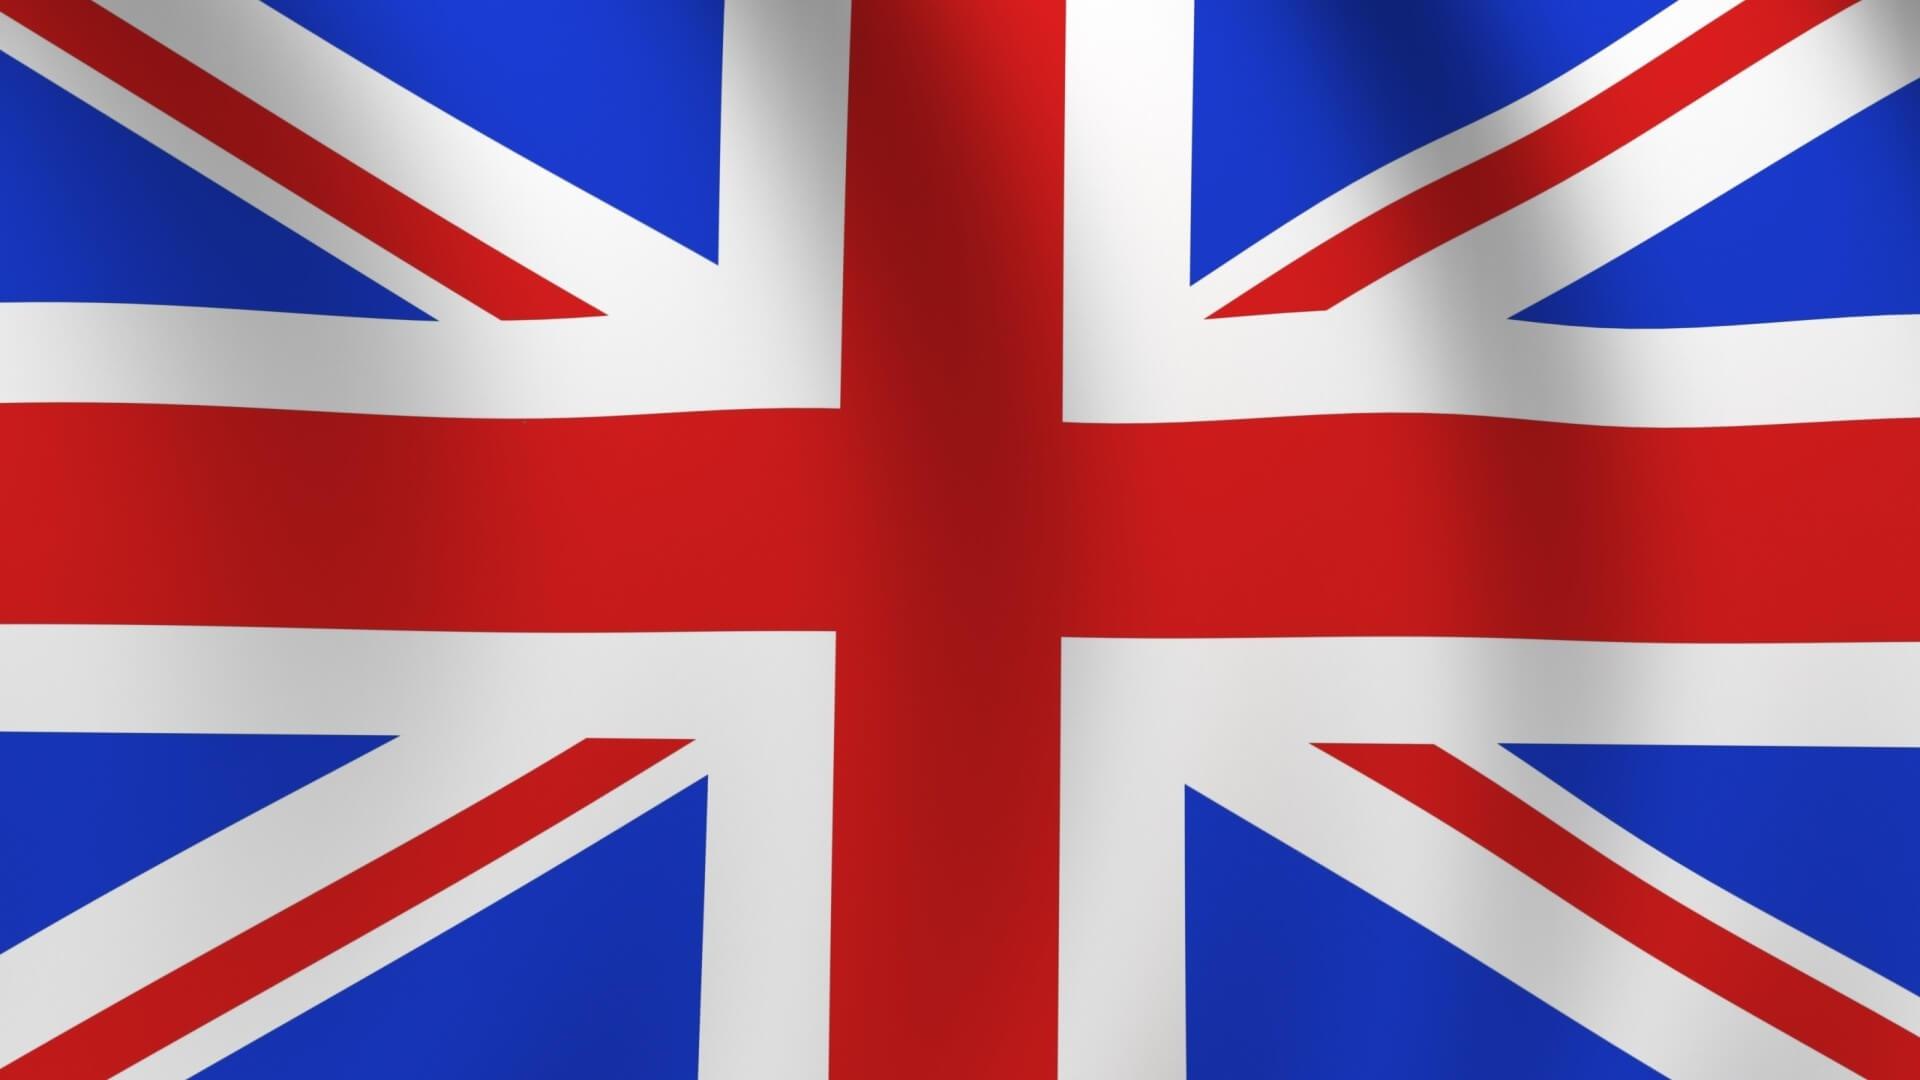 union_jack_flag-1920x1080